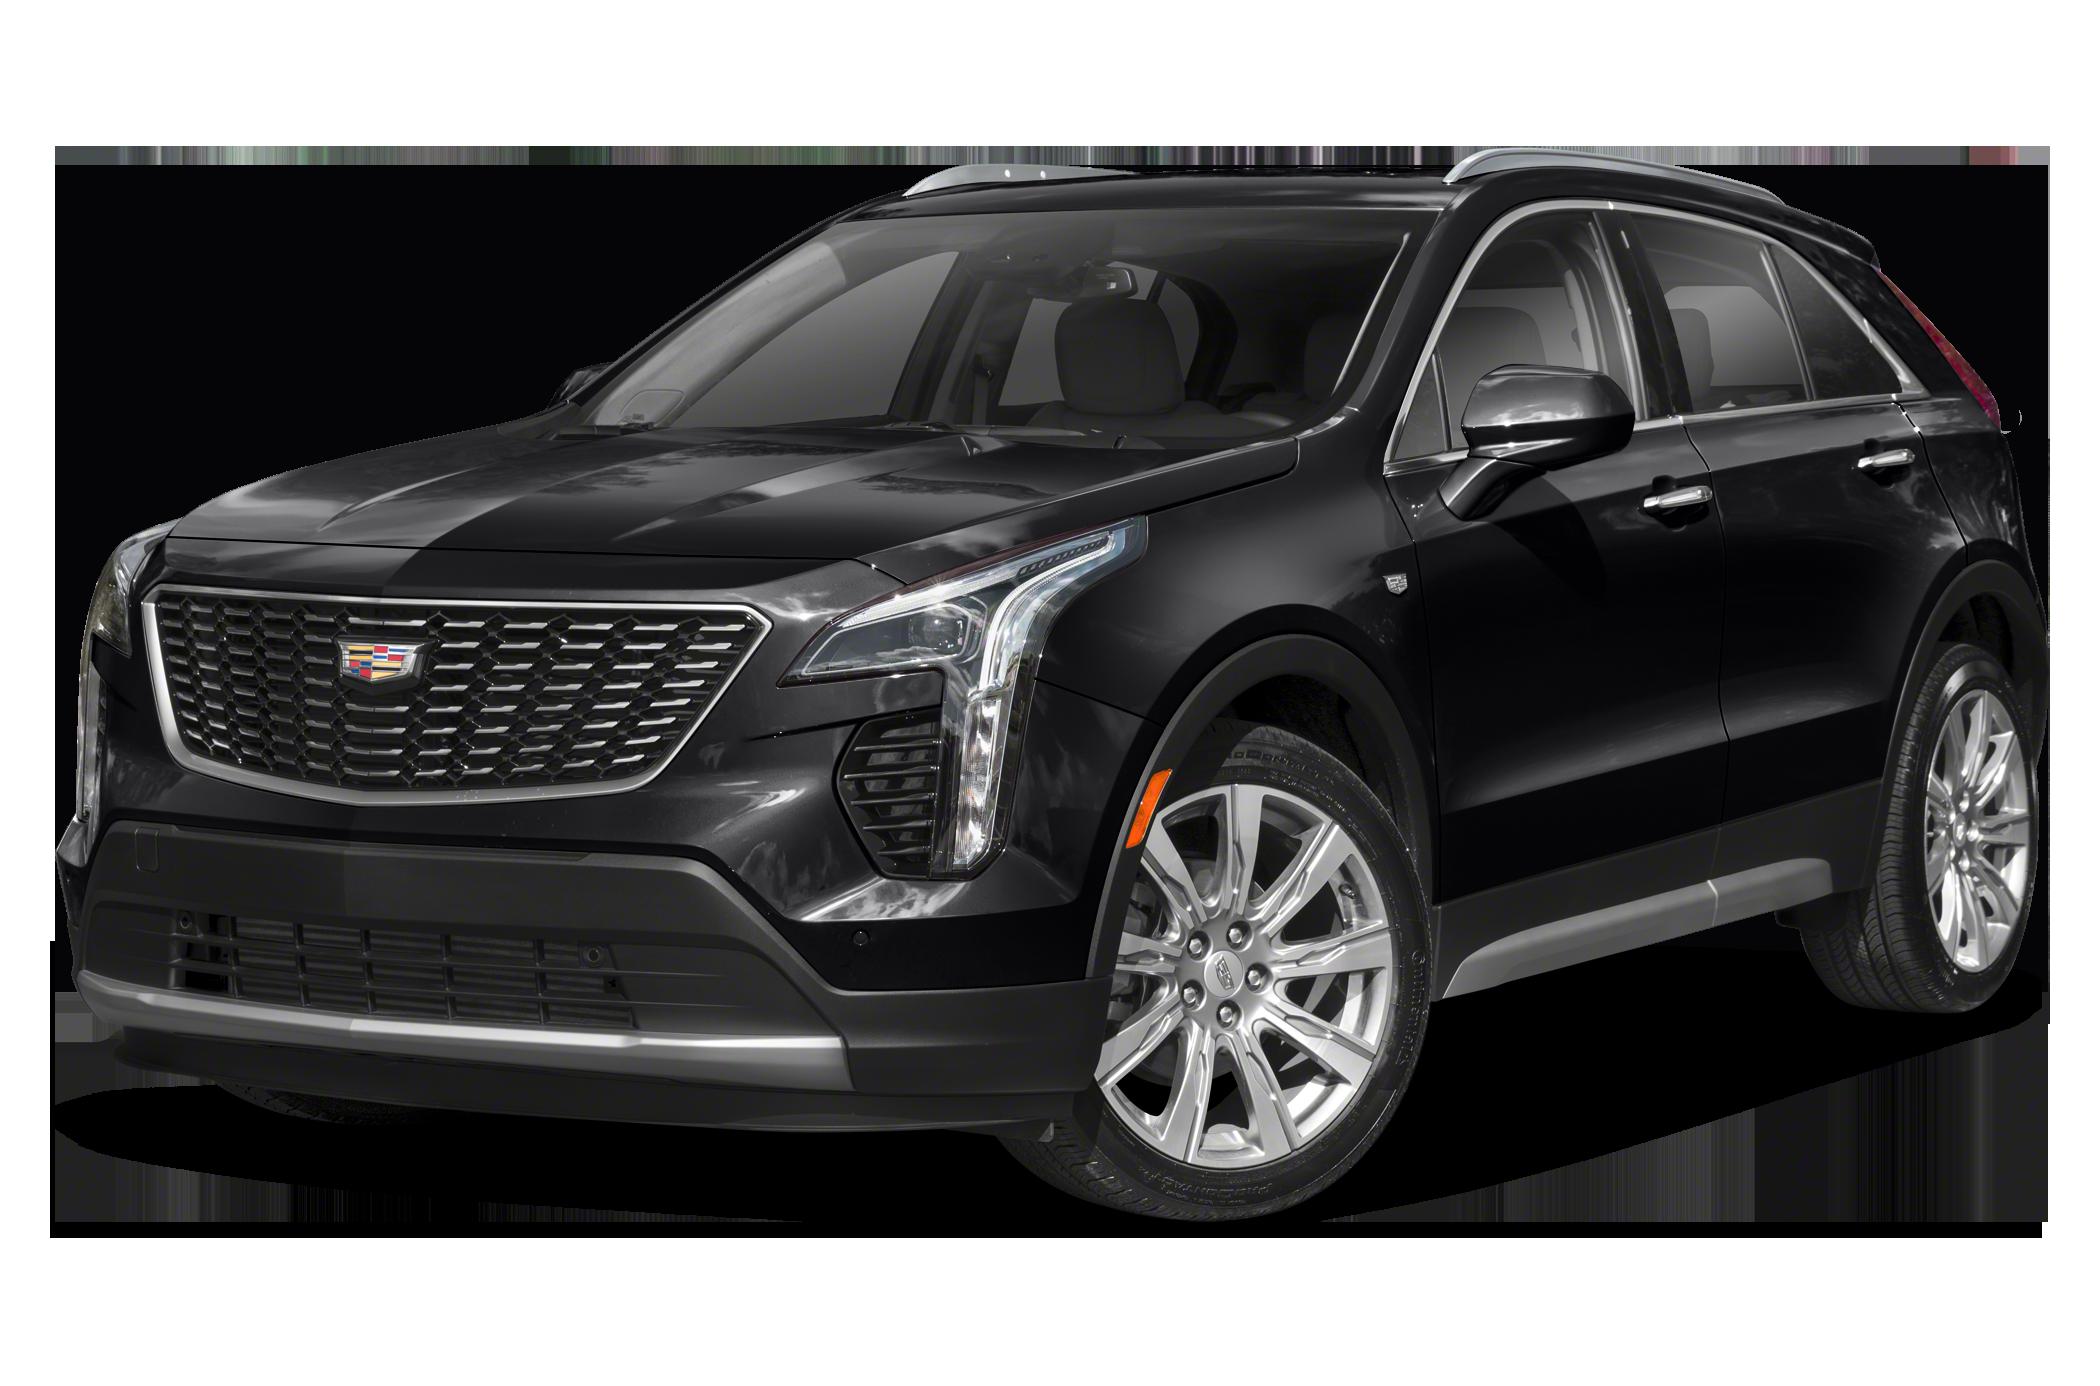 Cadillac cancels Lyriq EV debut because of the coronavirus